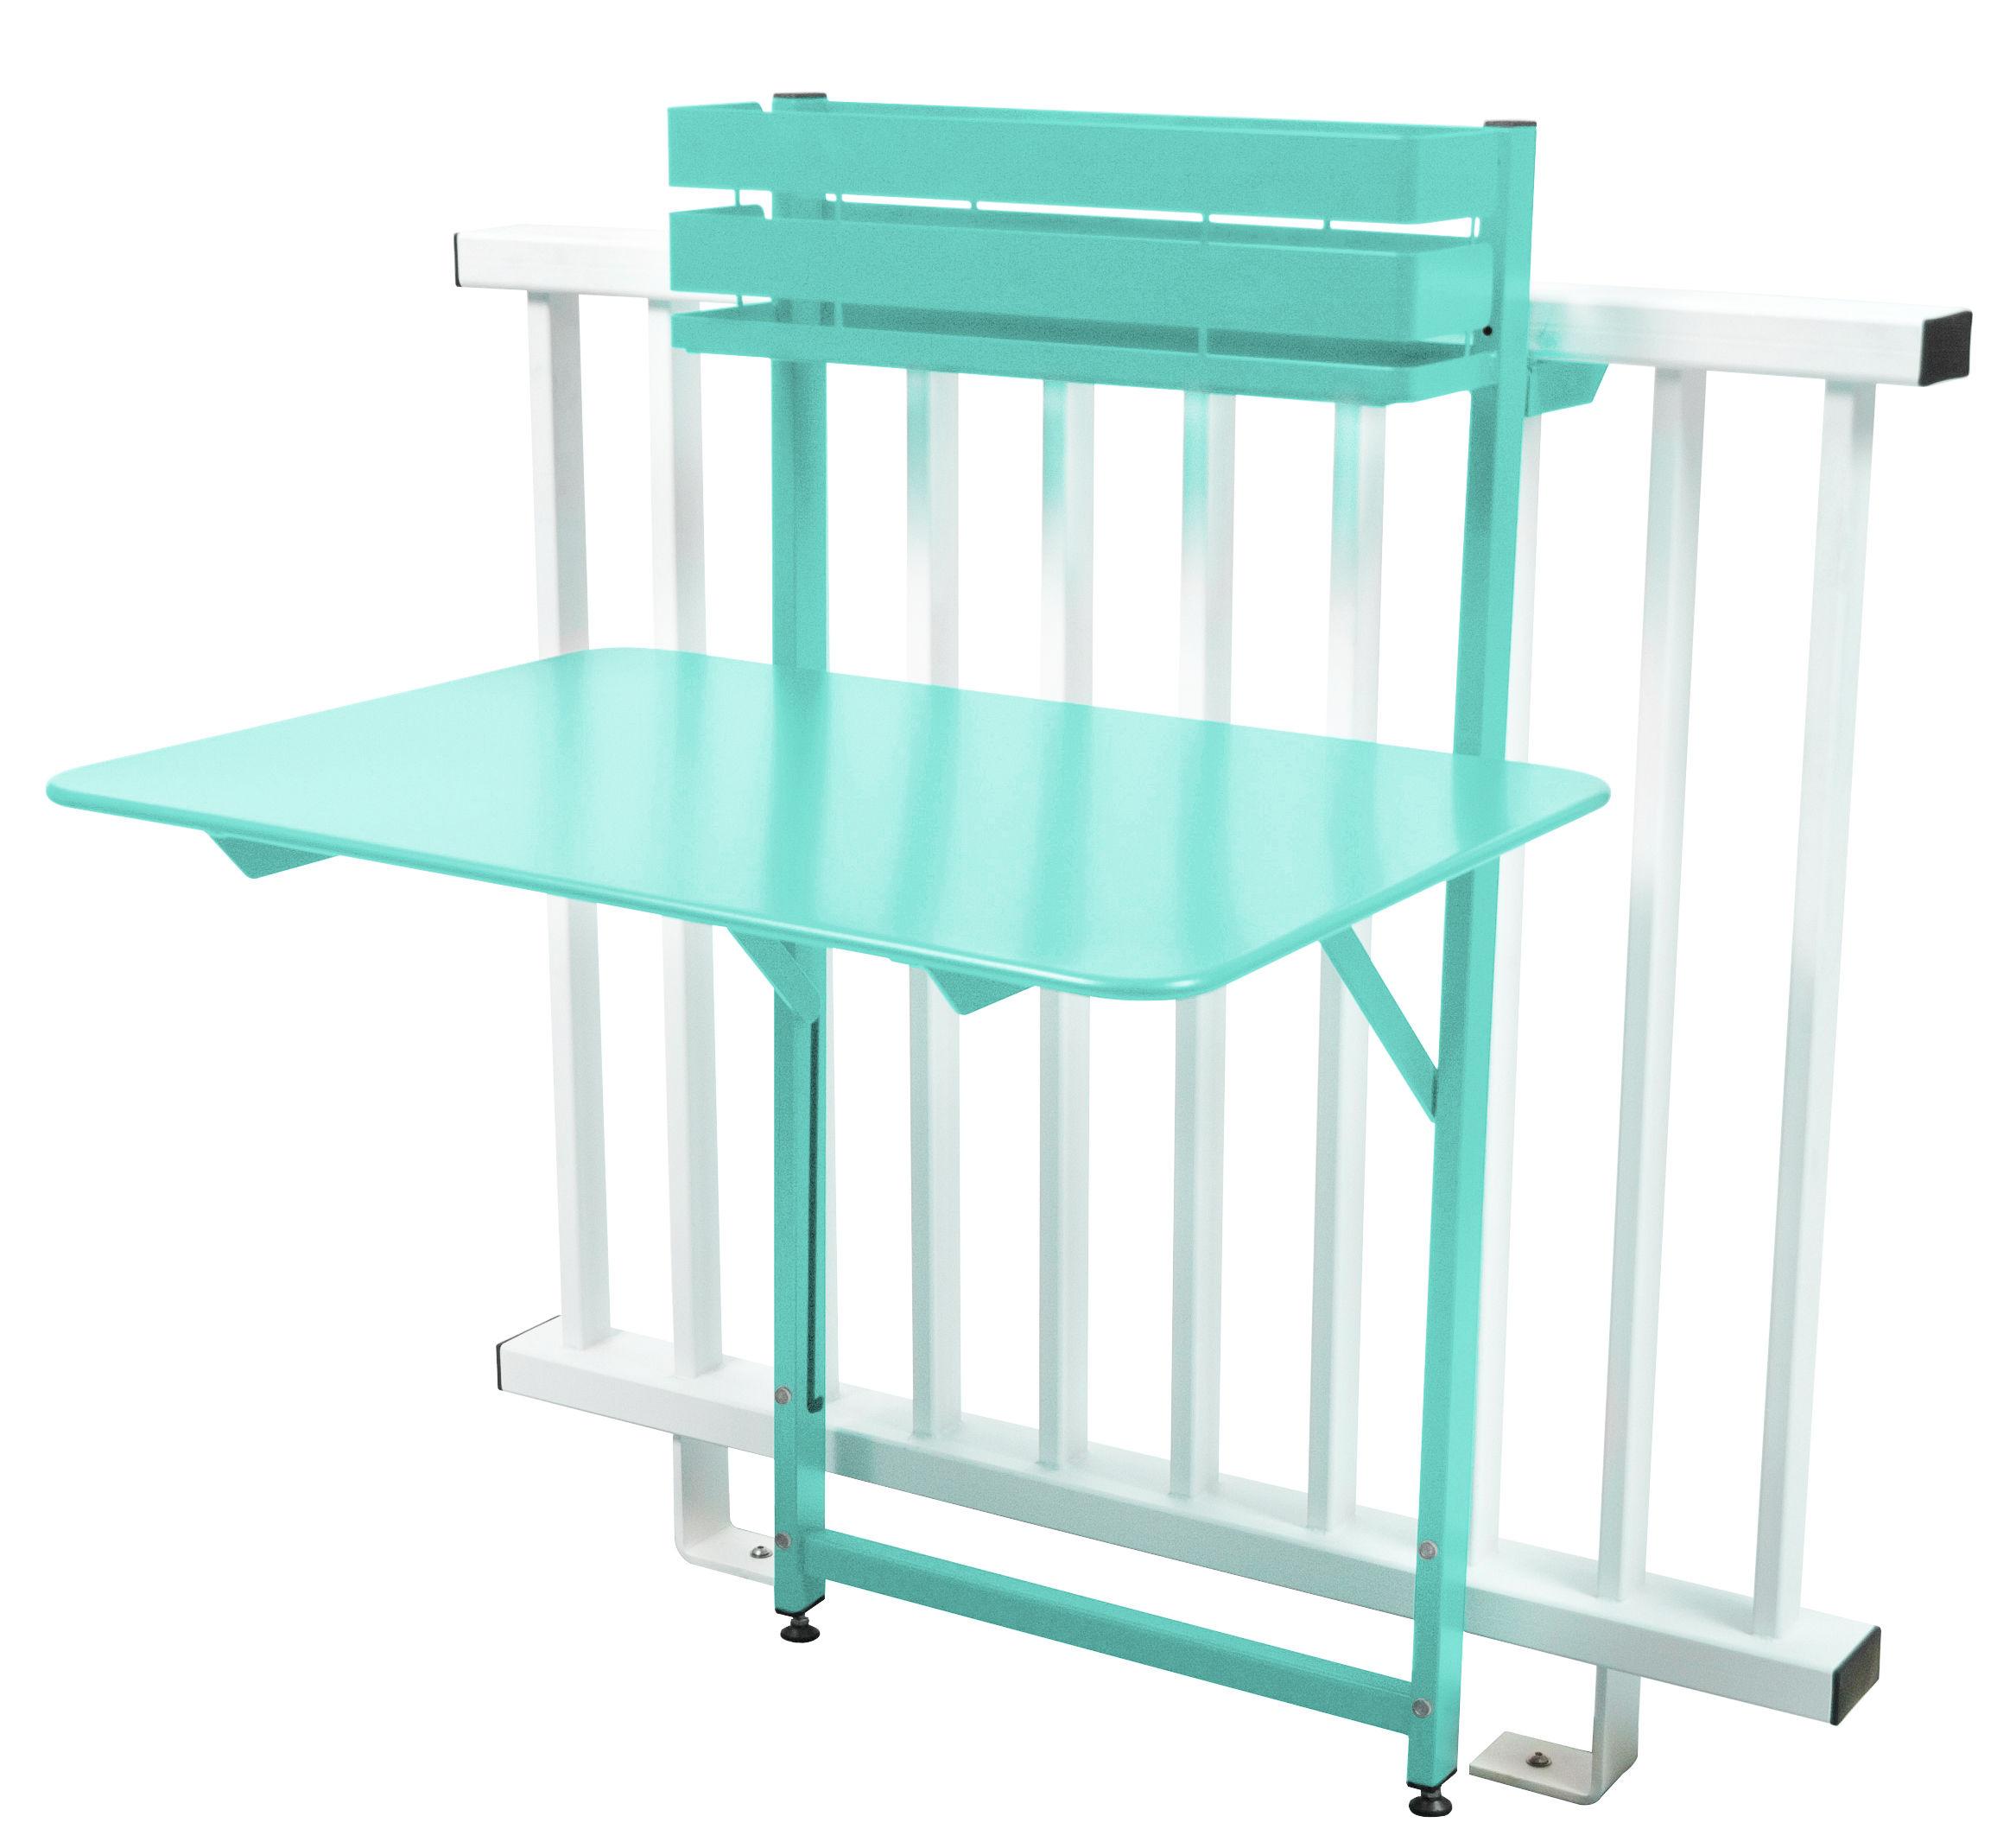 Table pliante balcon bistro rabattable 77 x 64 cm bleu lagune fermob Table balcon pliante rabattable